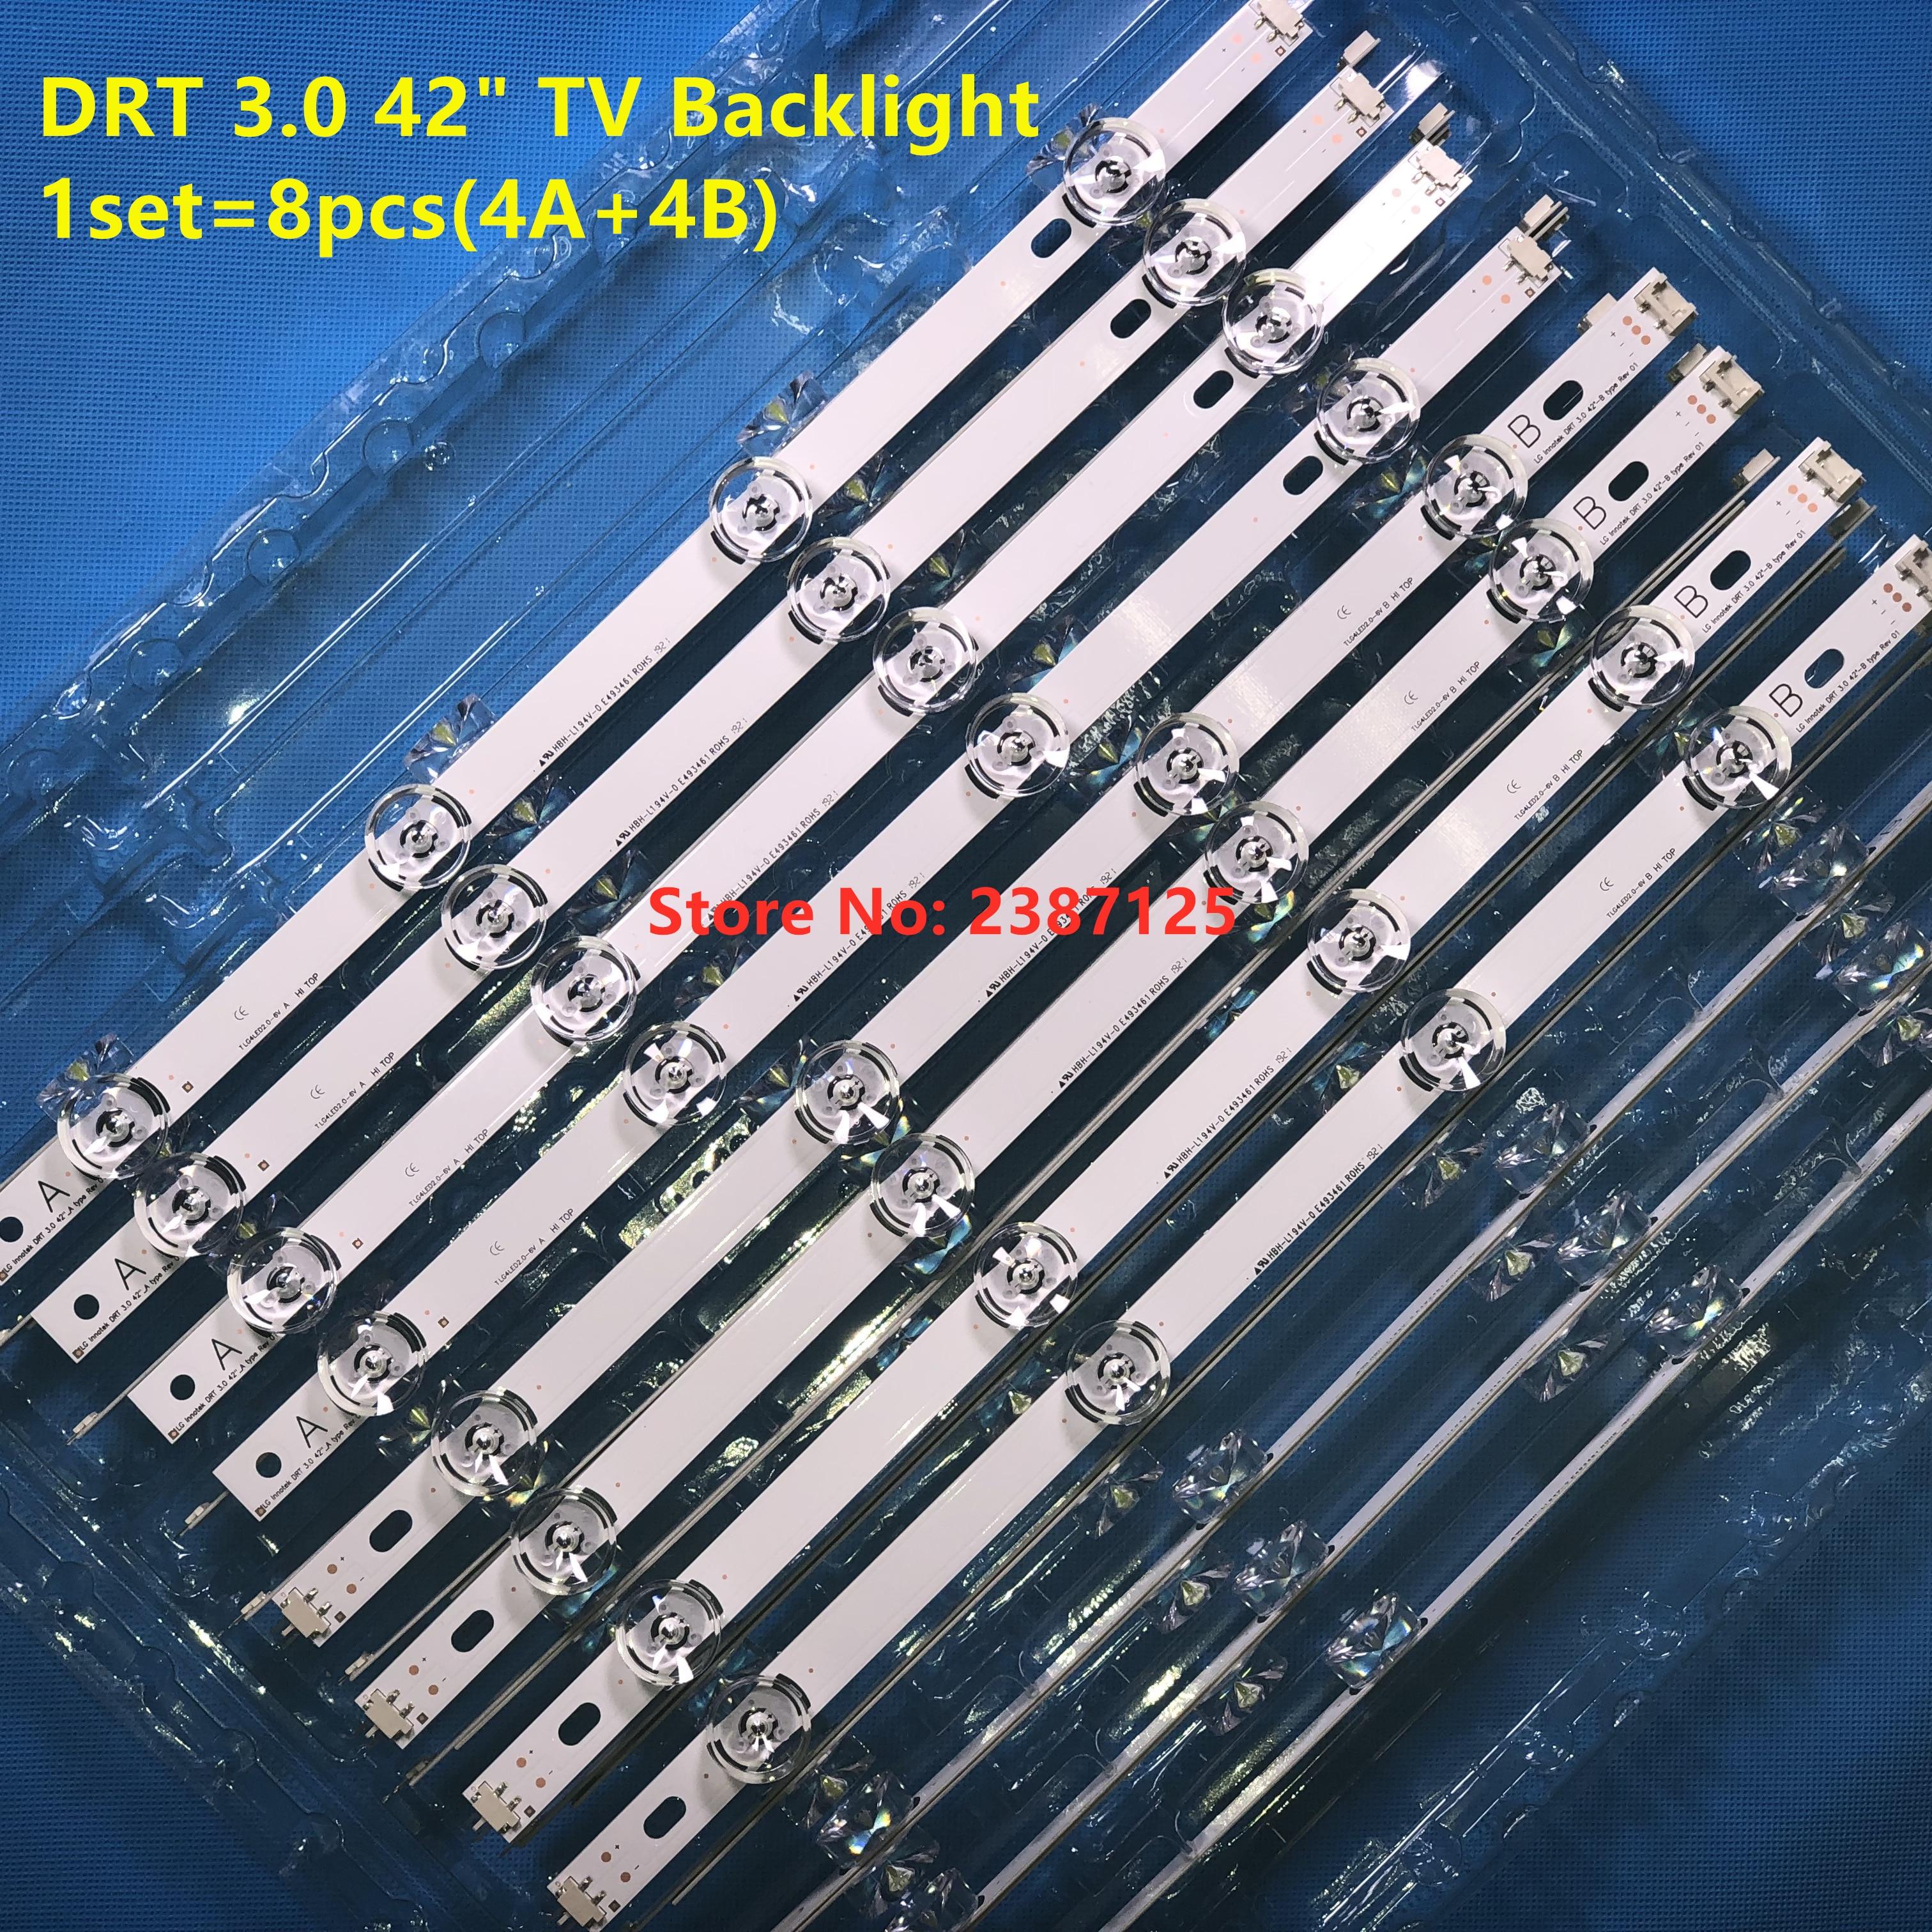 100% Original New LED Backlight Strip Bar For LG LC420DUE 42LB3910 INNOTEK DRT 3.0 42 Inch A B 6916L-1709A 6916L-1710A 42LF550V